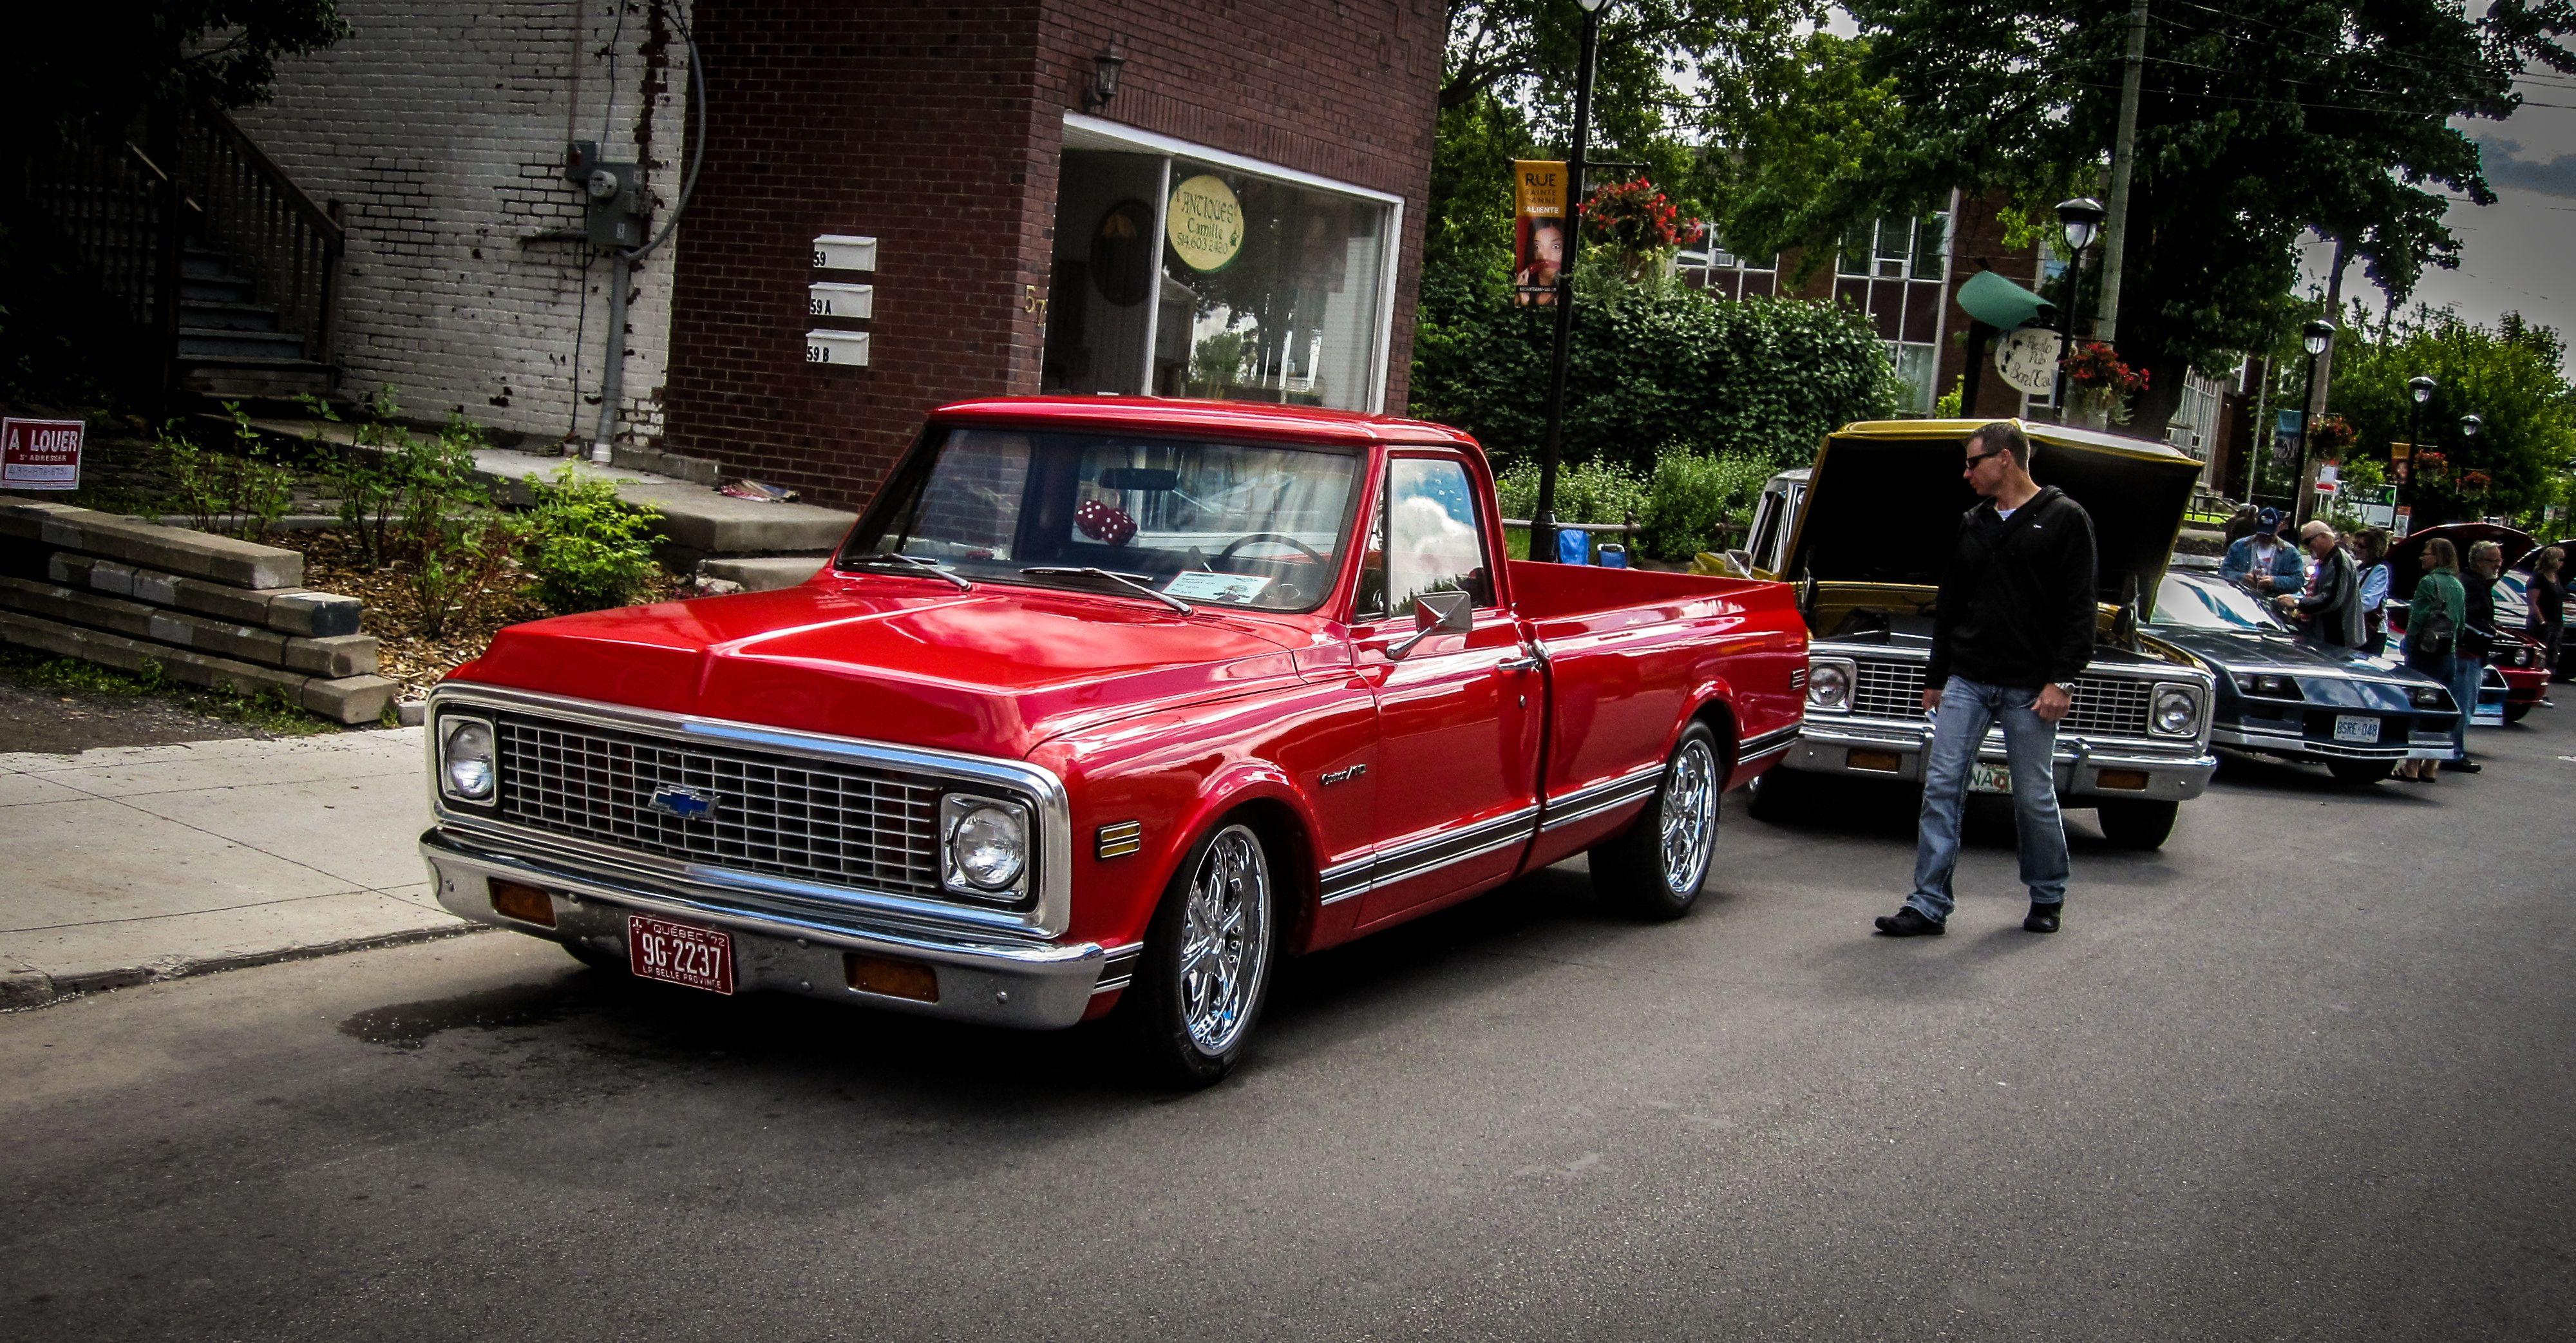 Chevy C10 72 Classic Chevy Trucks Chevy C10 Chevy Trucks